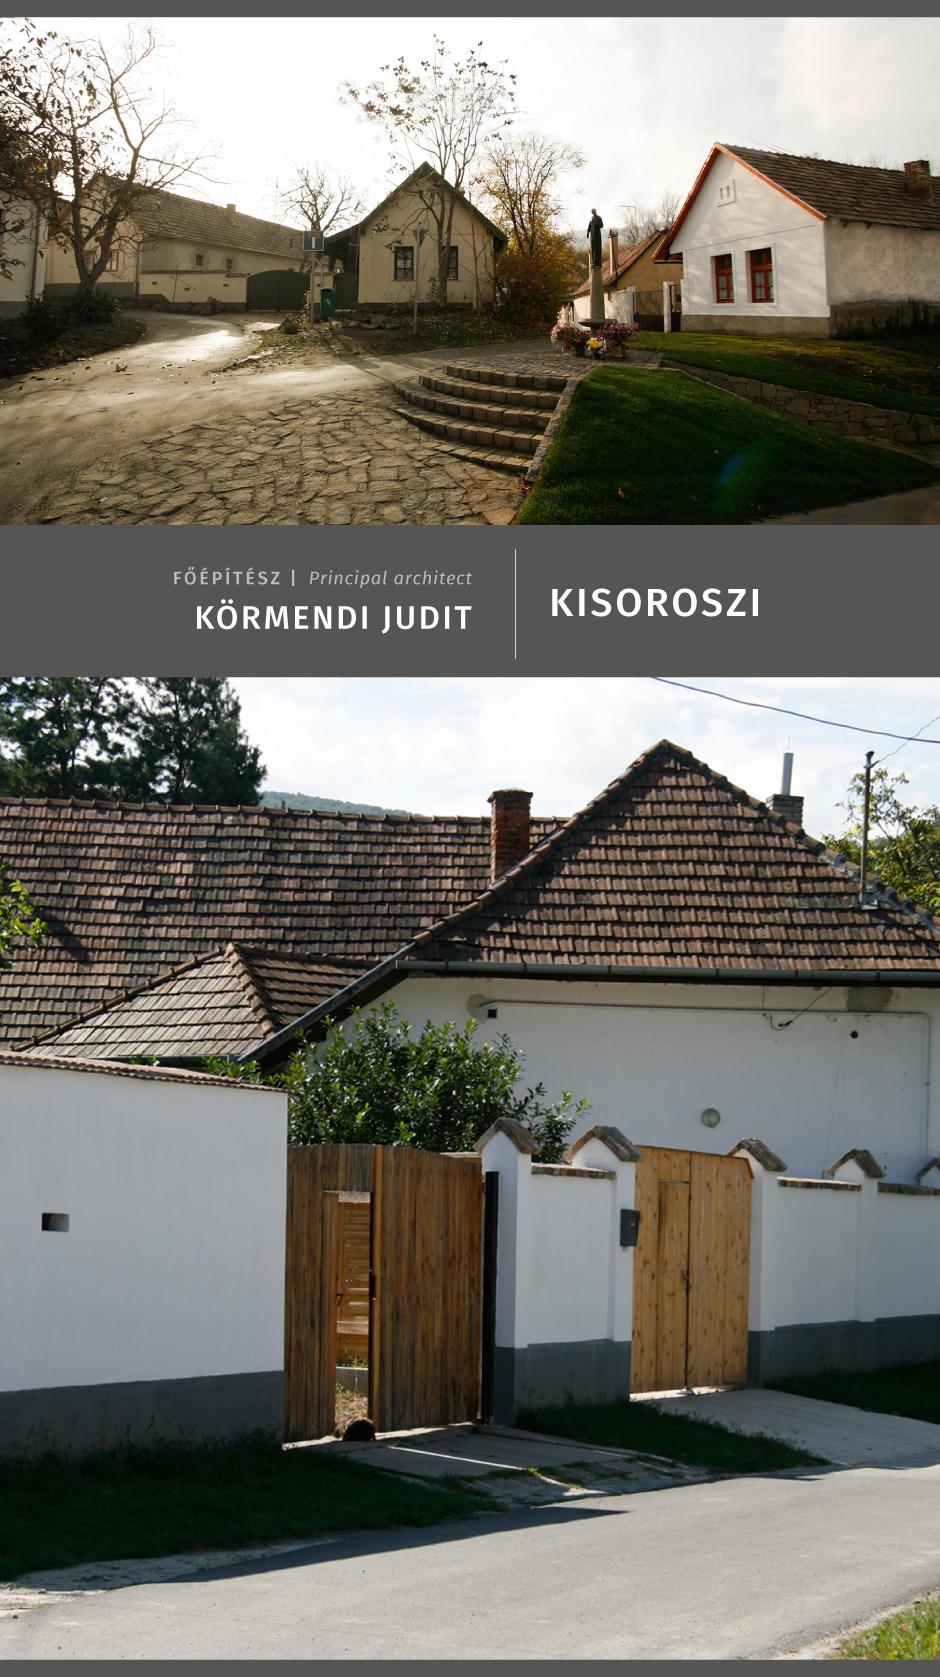 tablo_kisoroszi-940x1677